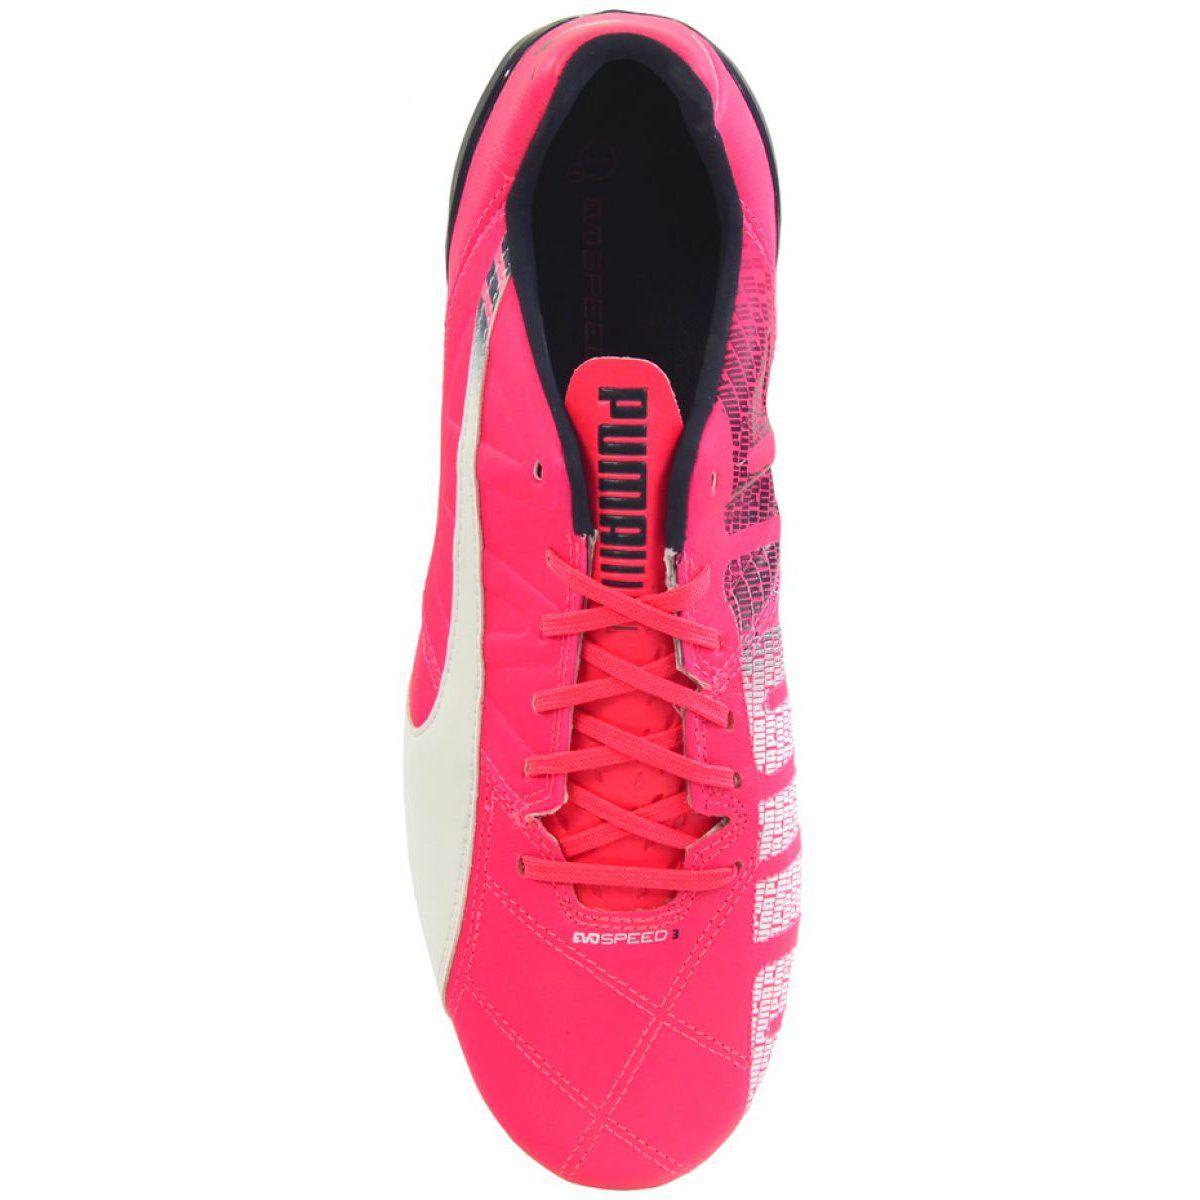 Buty Pilkarskie Puma Evo Speed 3 3 Fg M 103014 03 Rozowe Rozowe Puma Sport Shoes Shoes